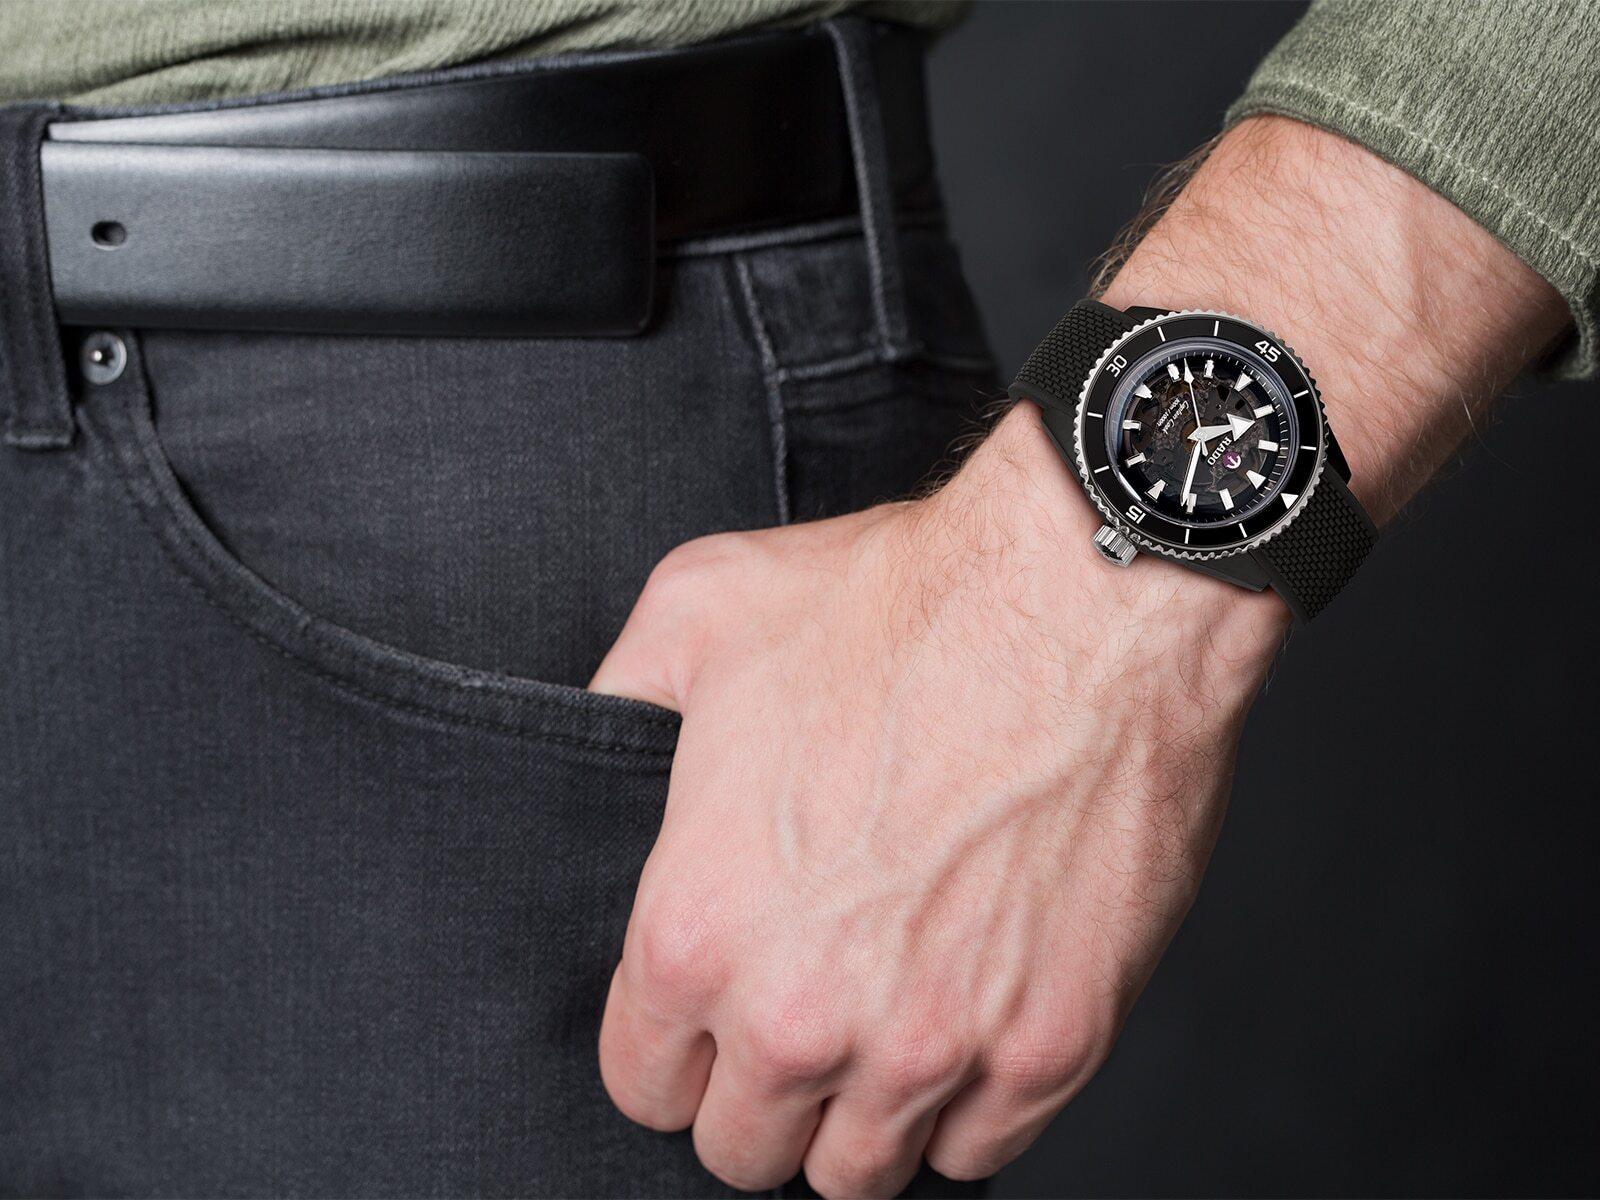 【RADO ラドー】Captain Cook High-Tech Ceramic キャプテンクック ハイテクセラミック(ブラックラバー)/国内正規品 腕時計